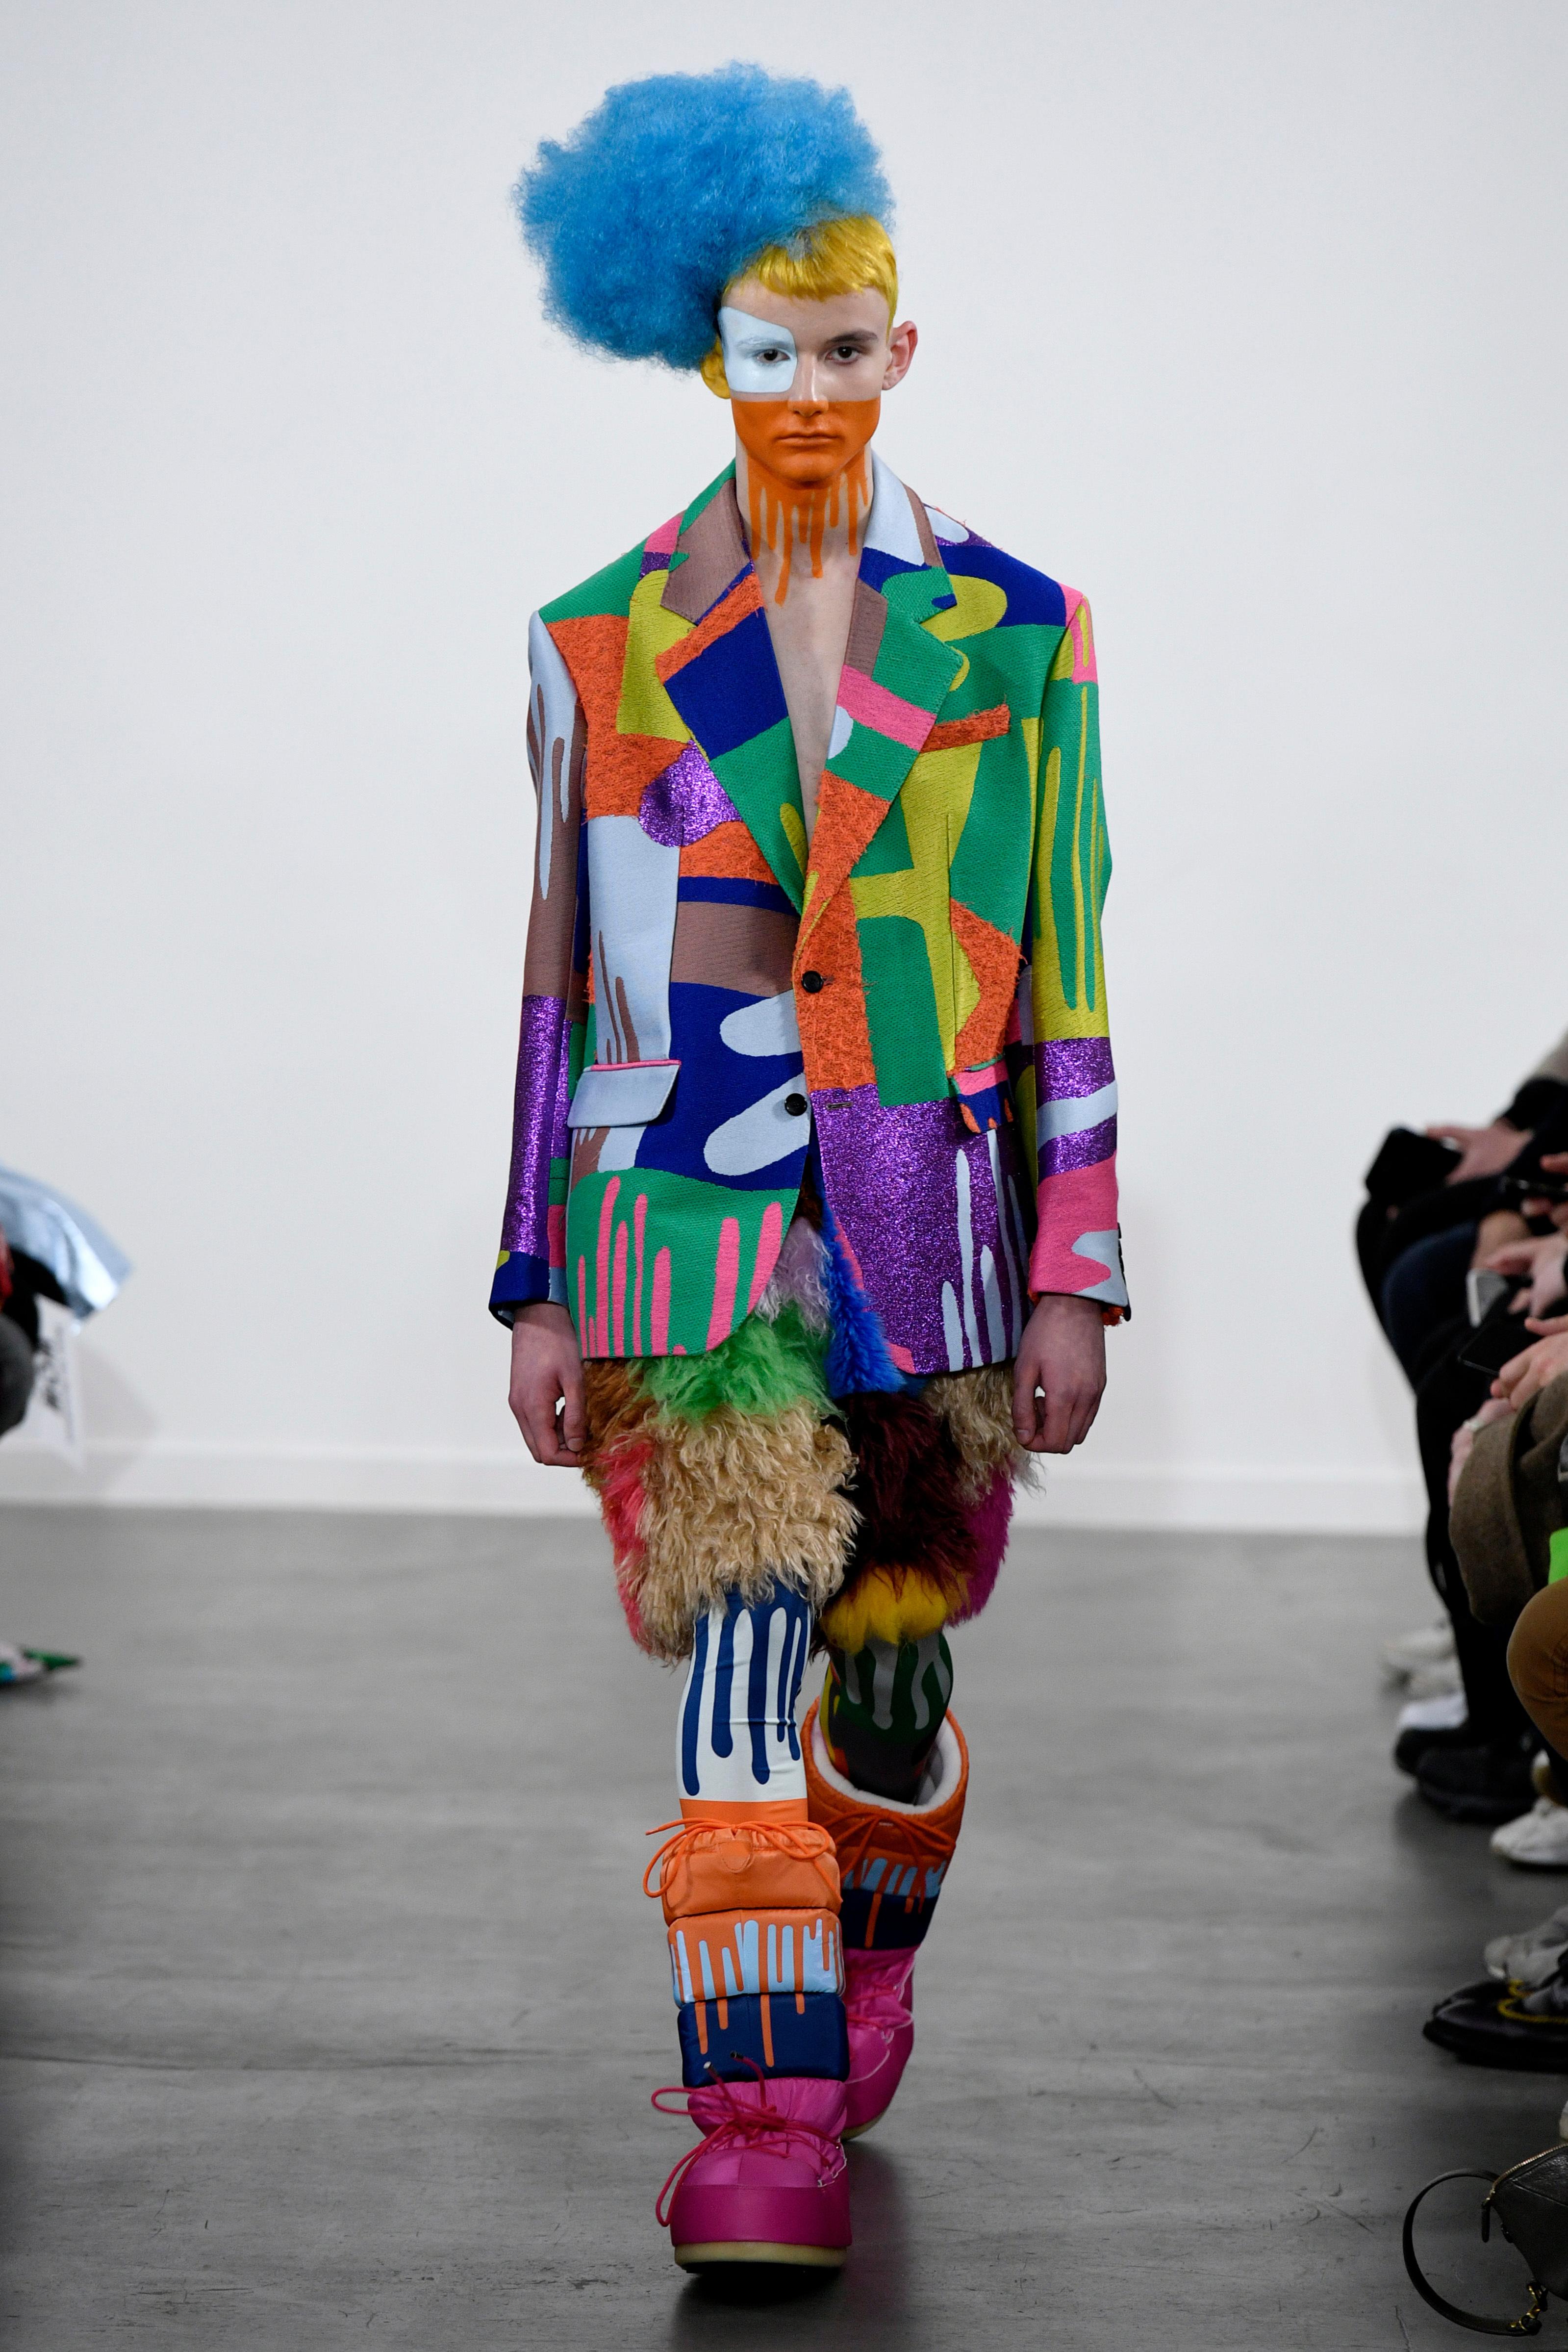 Model on the catwalkWalter Van Beirendonck show, Runway, Fall Winter 2019, Paris Fashion Week Men's, France - 16 Jan 2019